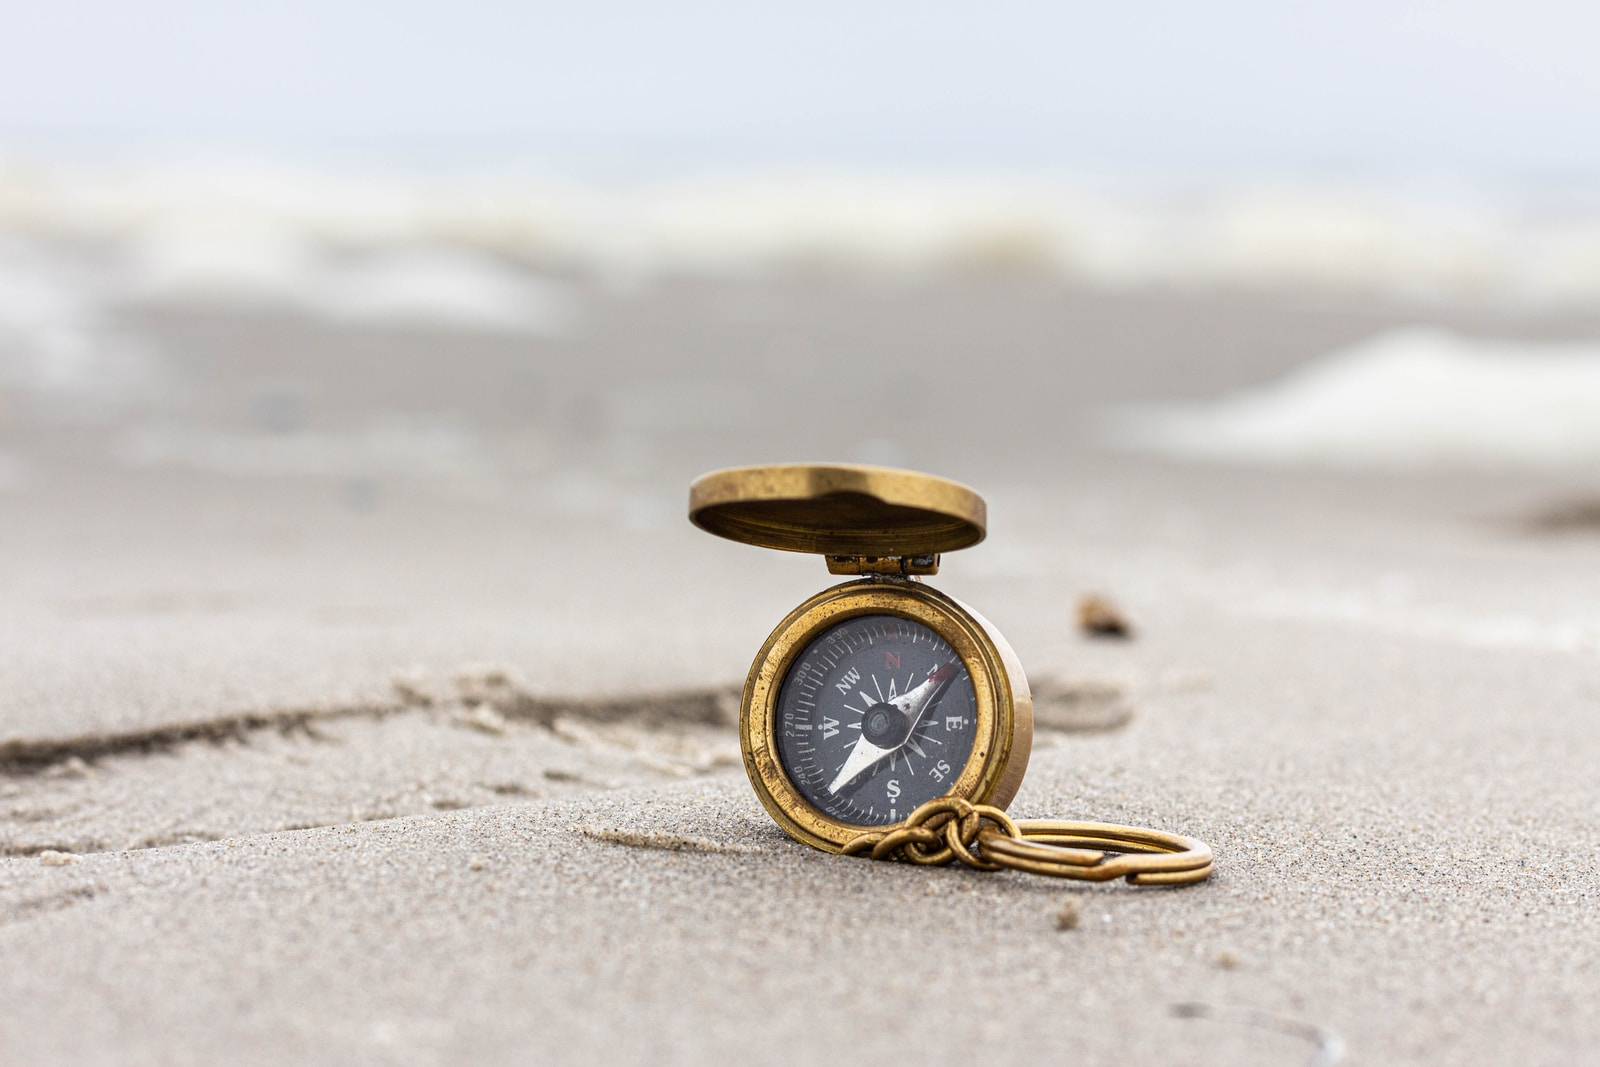 gold pocket watch on beach